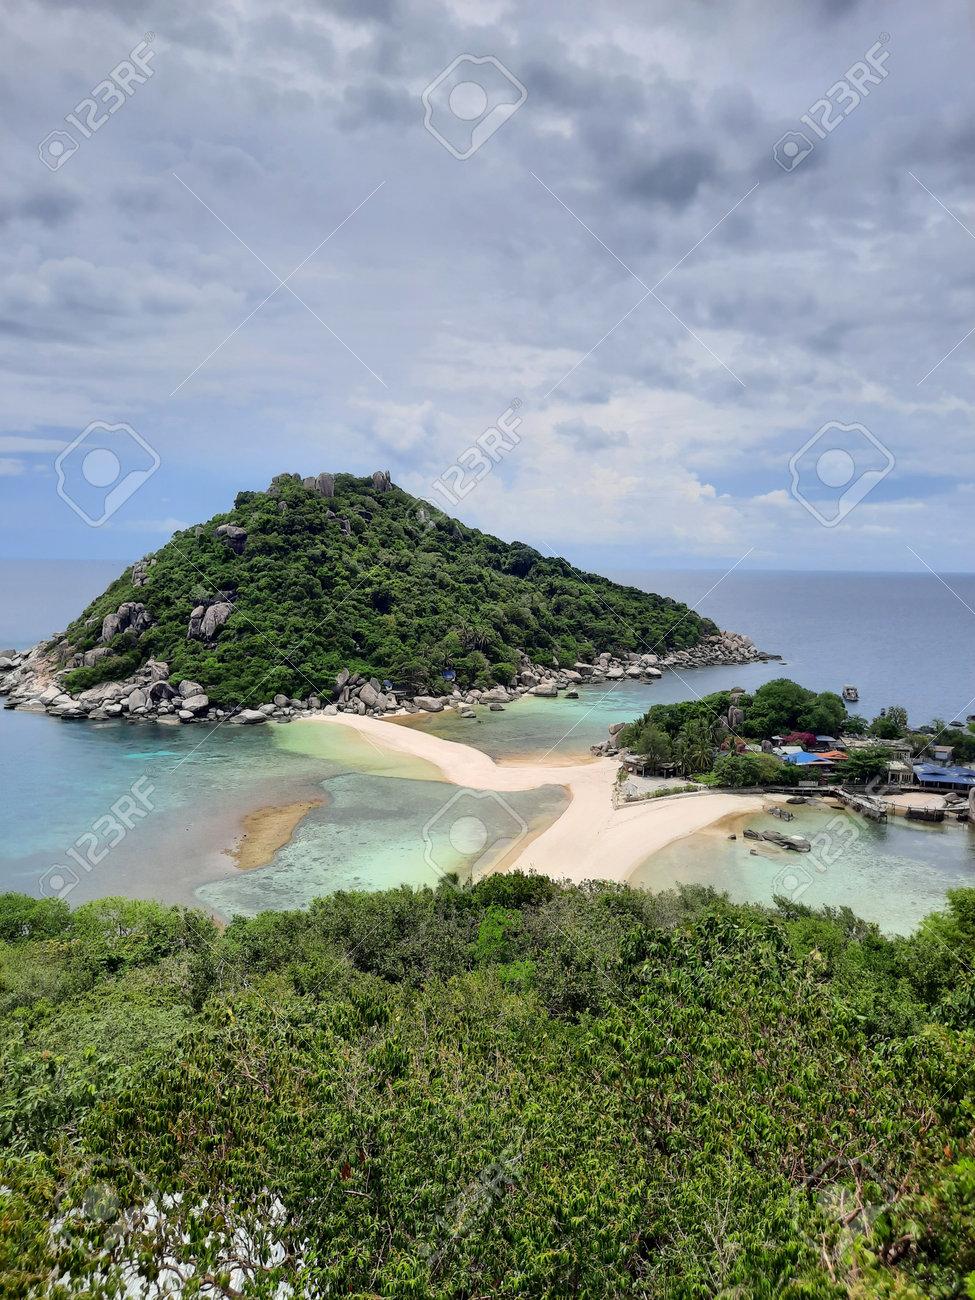 at the most famous viewpoint named Koh Nang Yuan Viewpoint on the tropical small island named Nangyuan Island Beach in Thailand next to the island named Koh Tao at midday, May 3, 2021 - 169664545